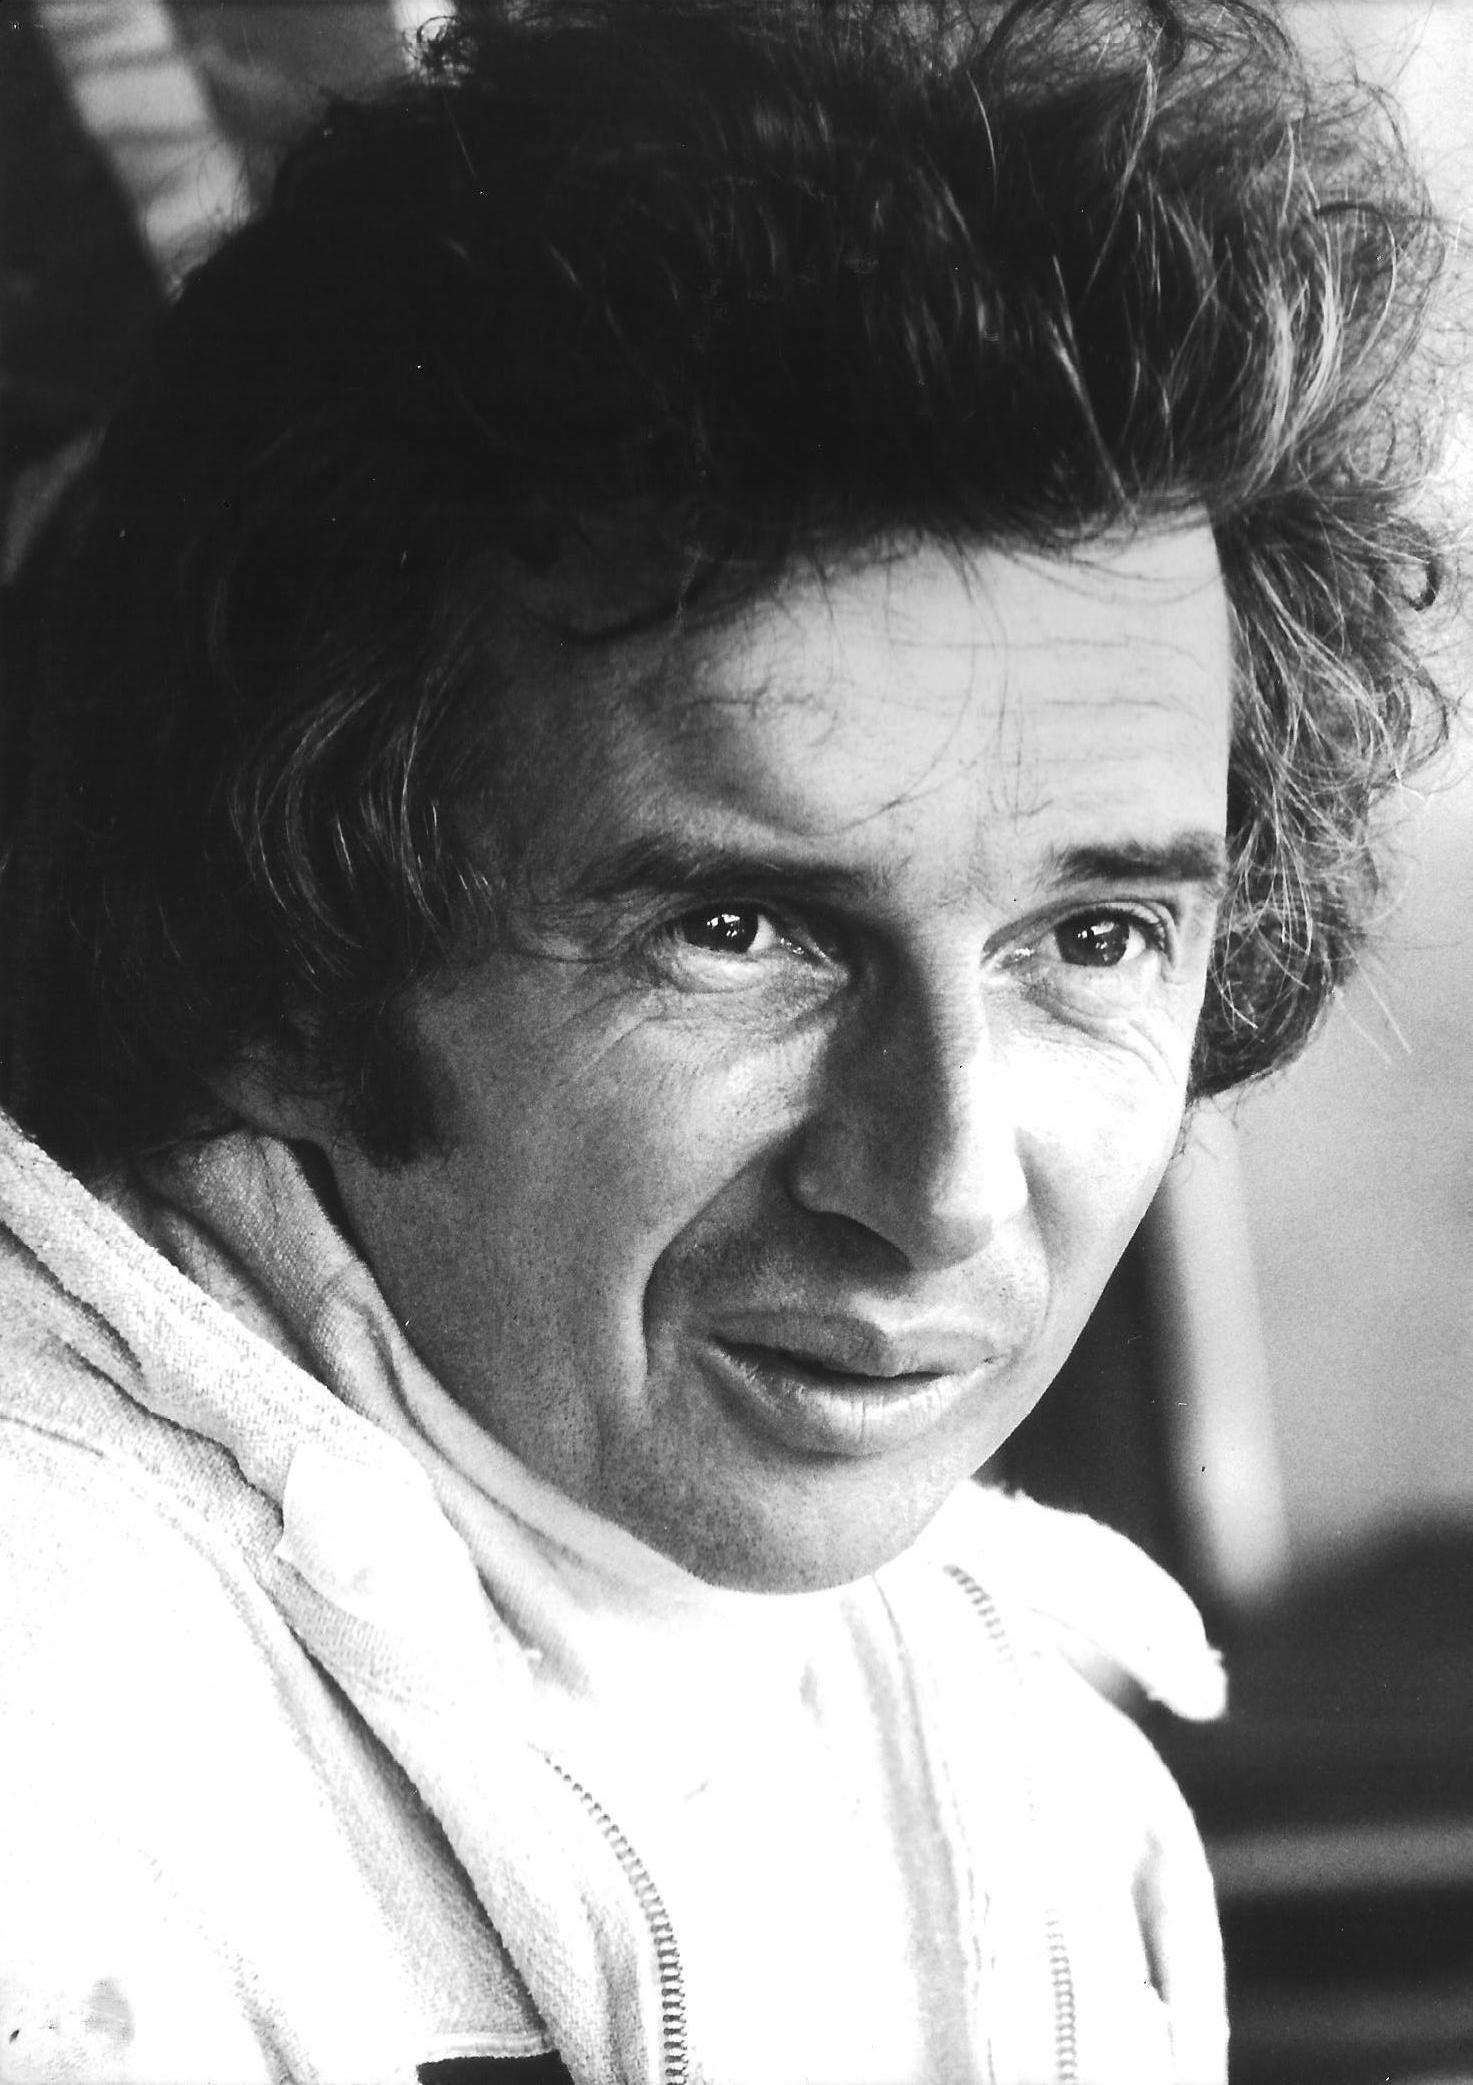 Jean-Pierre Beltoise, et son sourire malicieux...